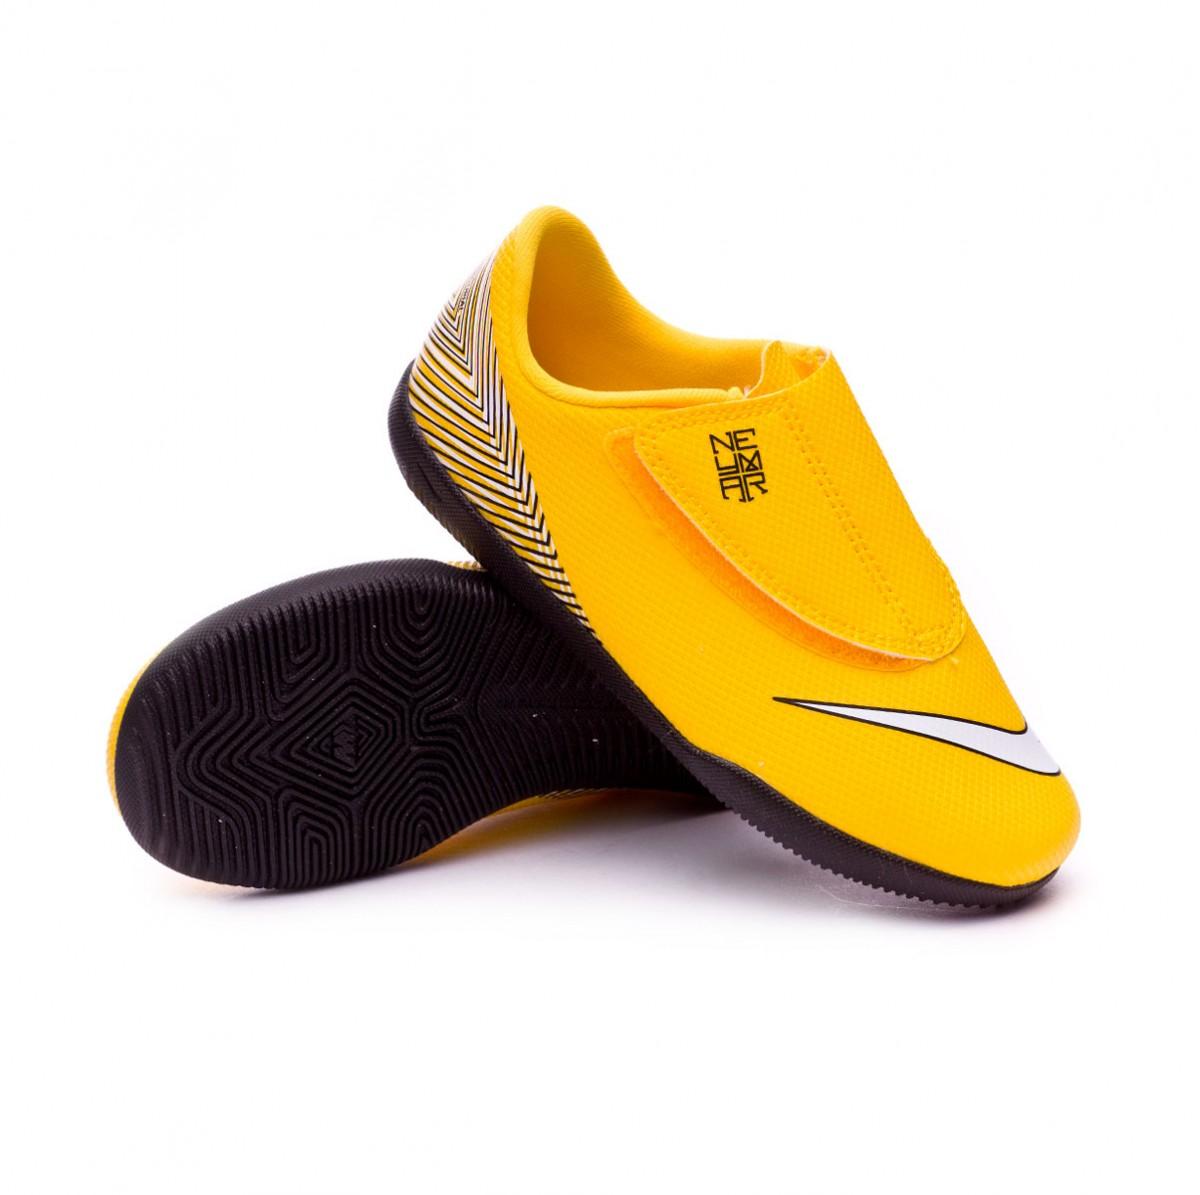 14a2d7d40 Sapatilha de Futsal Nike Mercurial VaporX XII Club IC Neymar Crianças